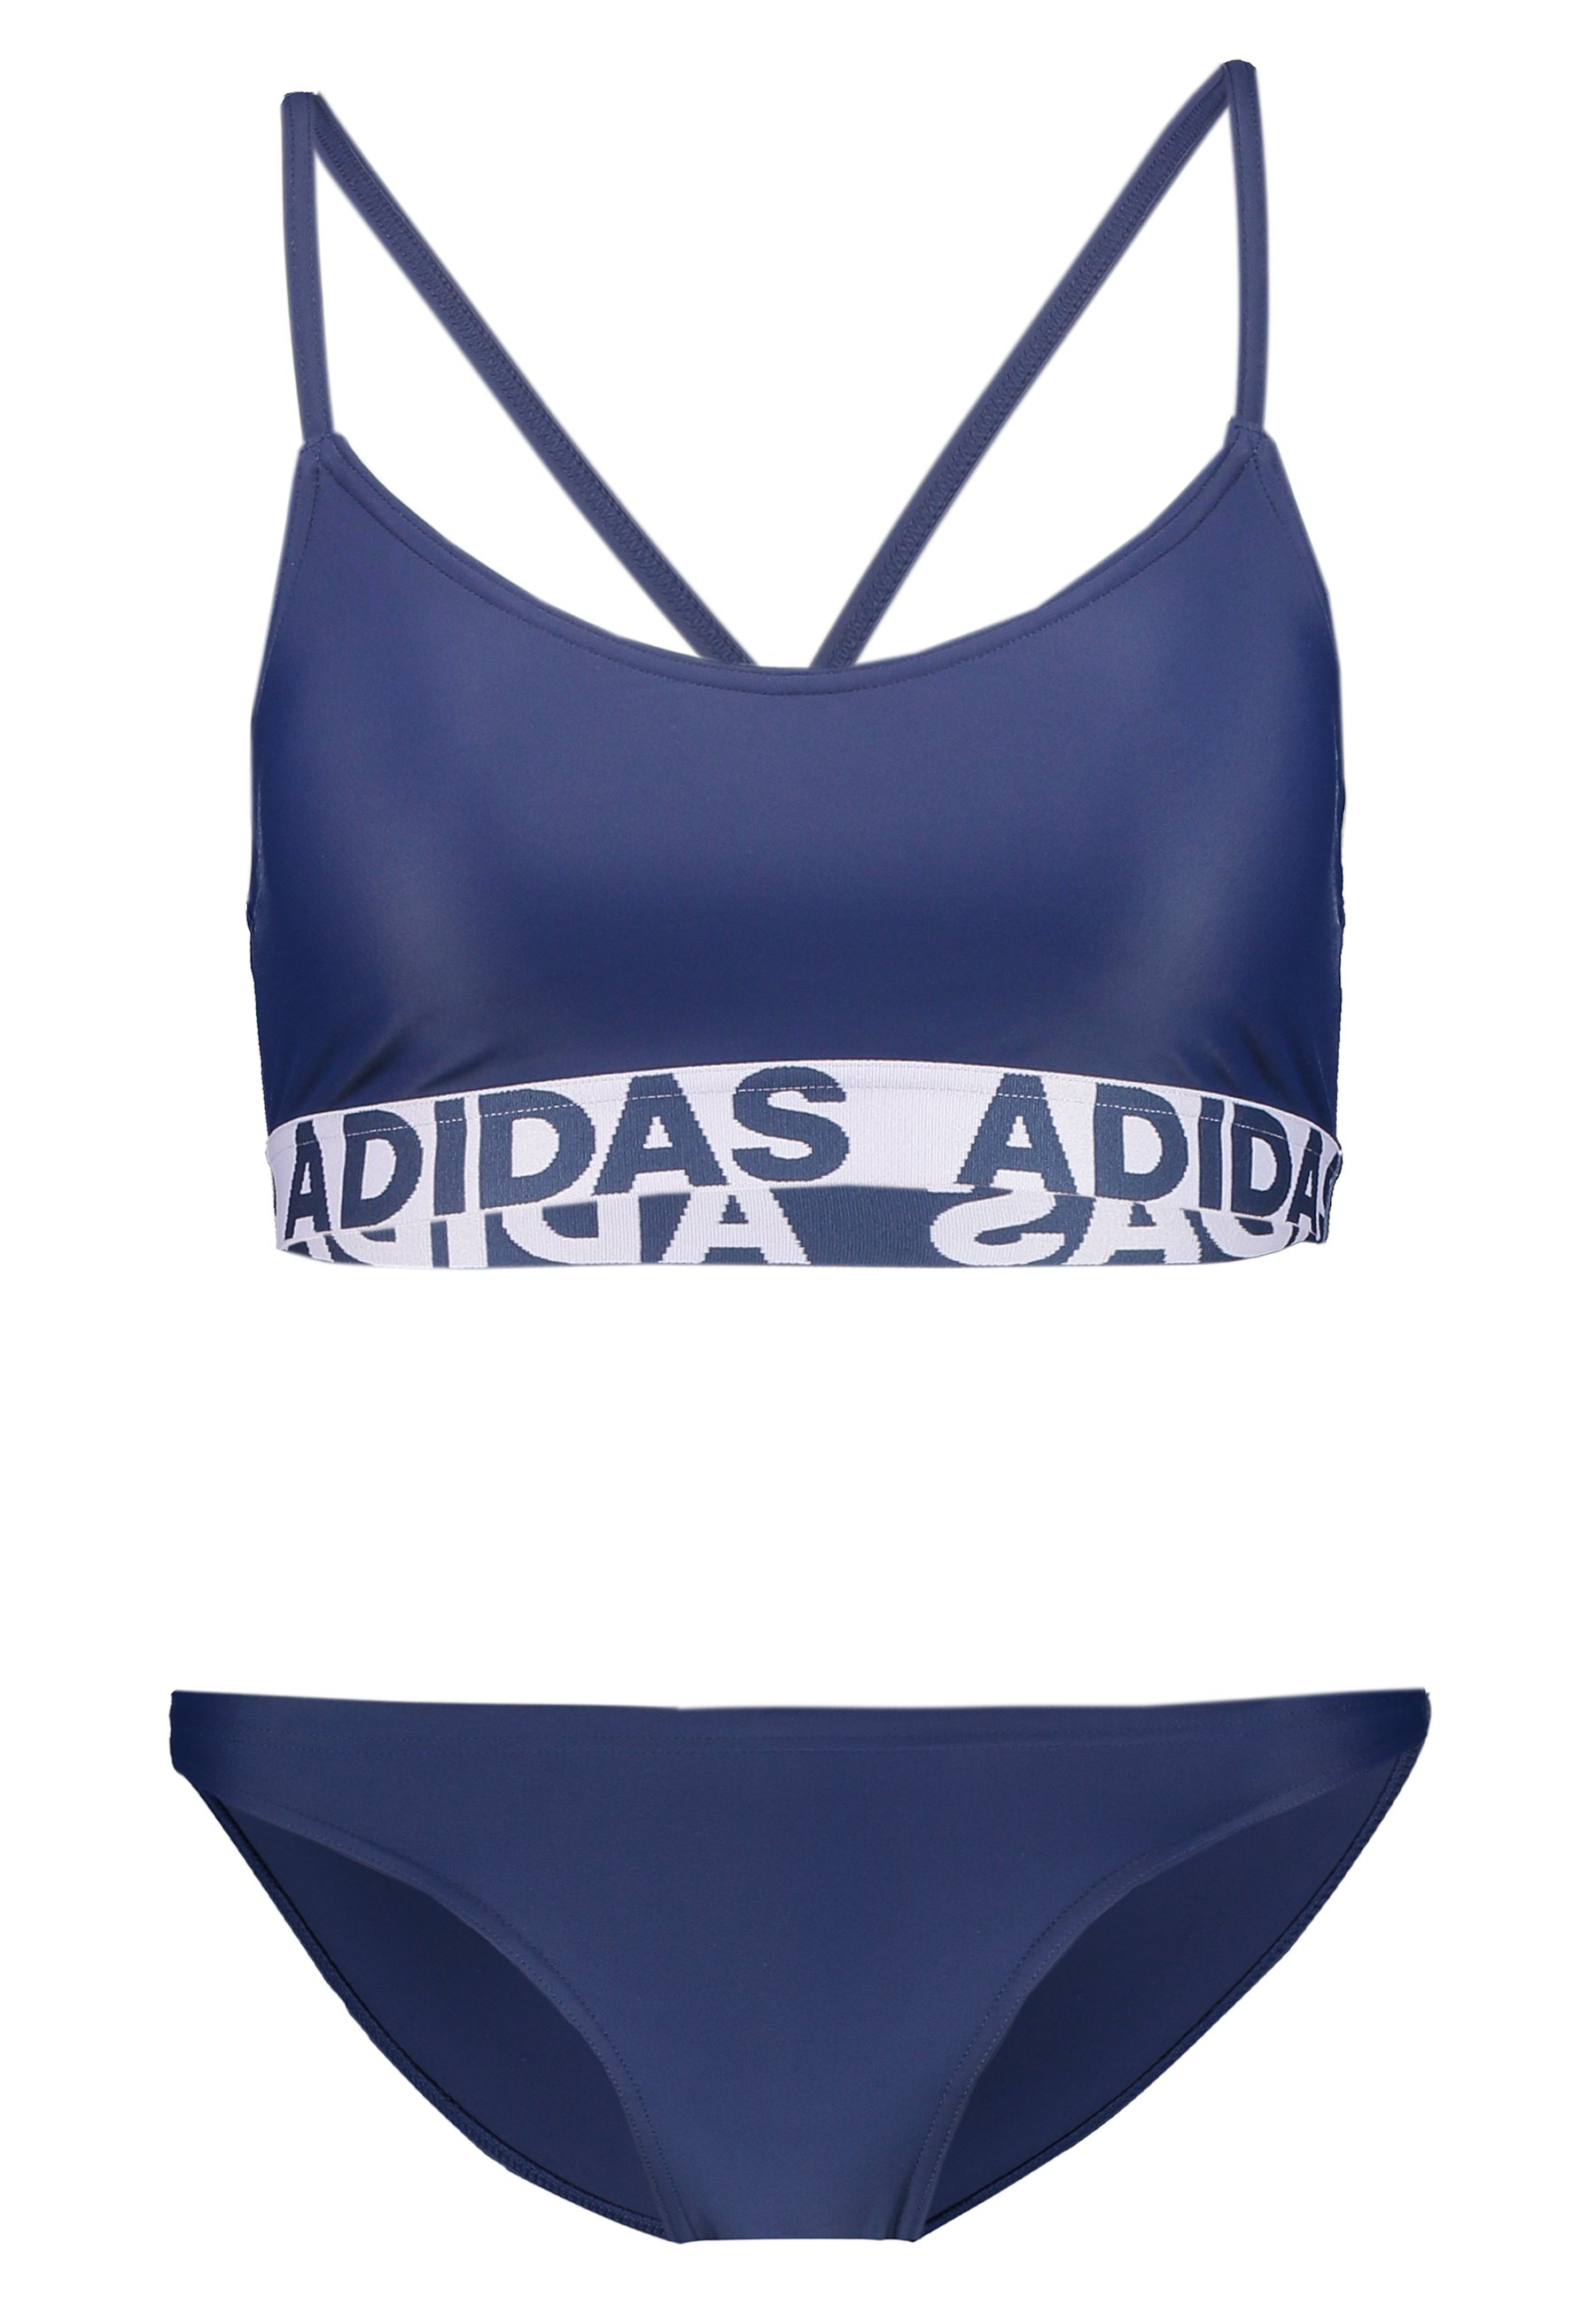 Adidas Performance Branded Set - Bikini Apsord